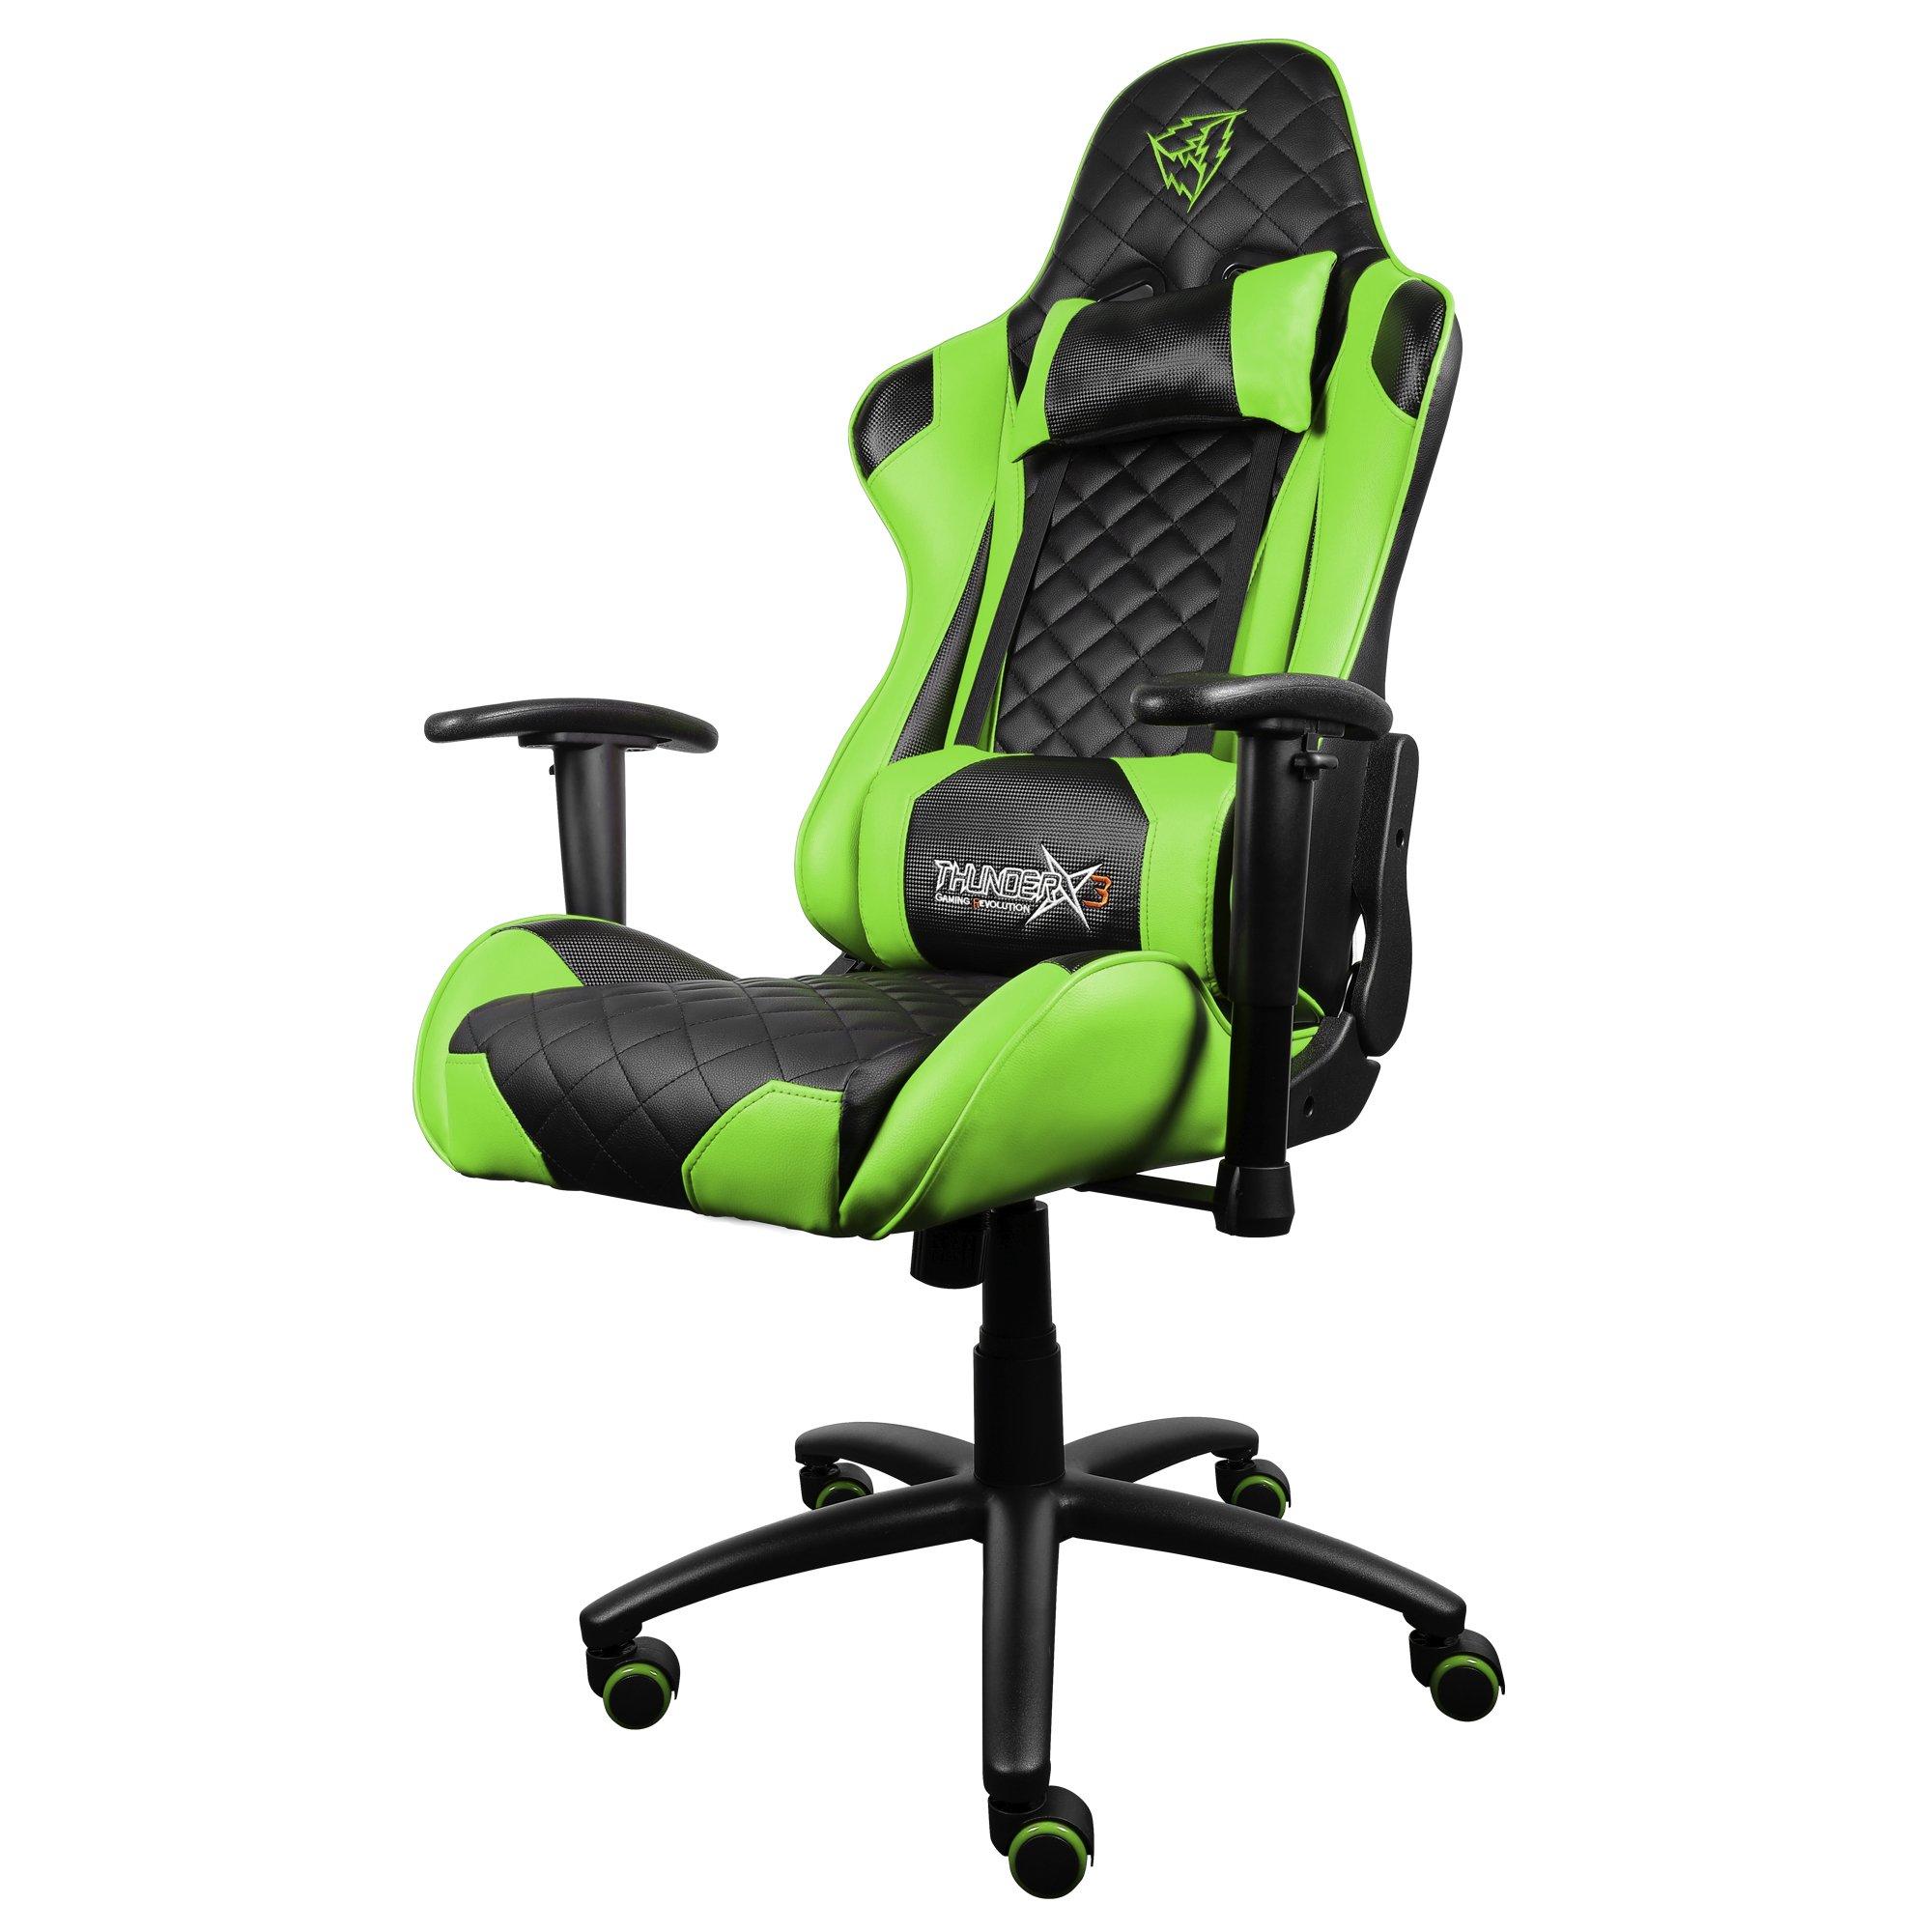 ThunderX3 TGC12BG-Silla gaming profesional- (Estilo Racing, Cuero sintético, Inclinación y Altura regulable, Apoyabrazos, Reposacabezas, Cojín lumbar) Color Negro y Verde